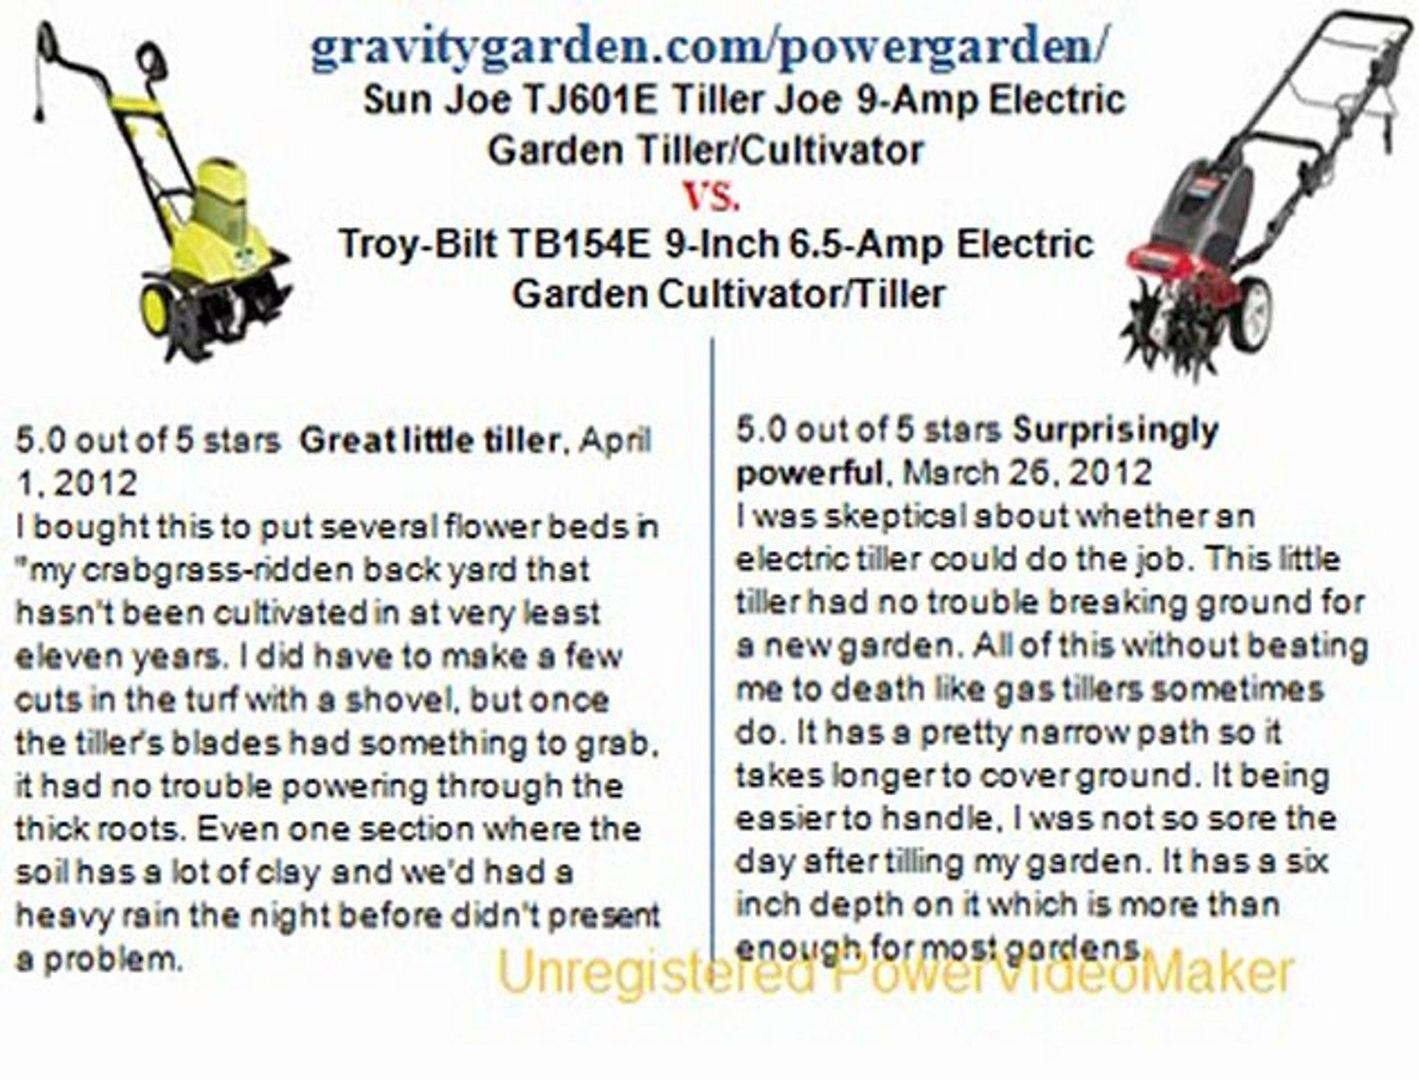 Sun Joe TJ601E Tiller Joe 9-Amp Electric Garden Tiller Cultivator  VS.Troy-Bilt TB154E 9-Inch 6.5-Am